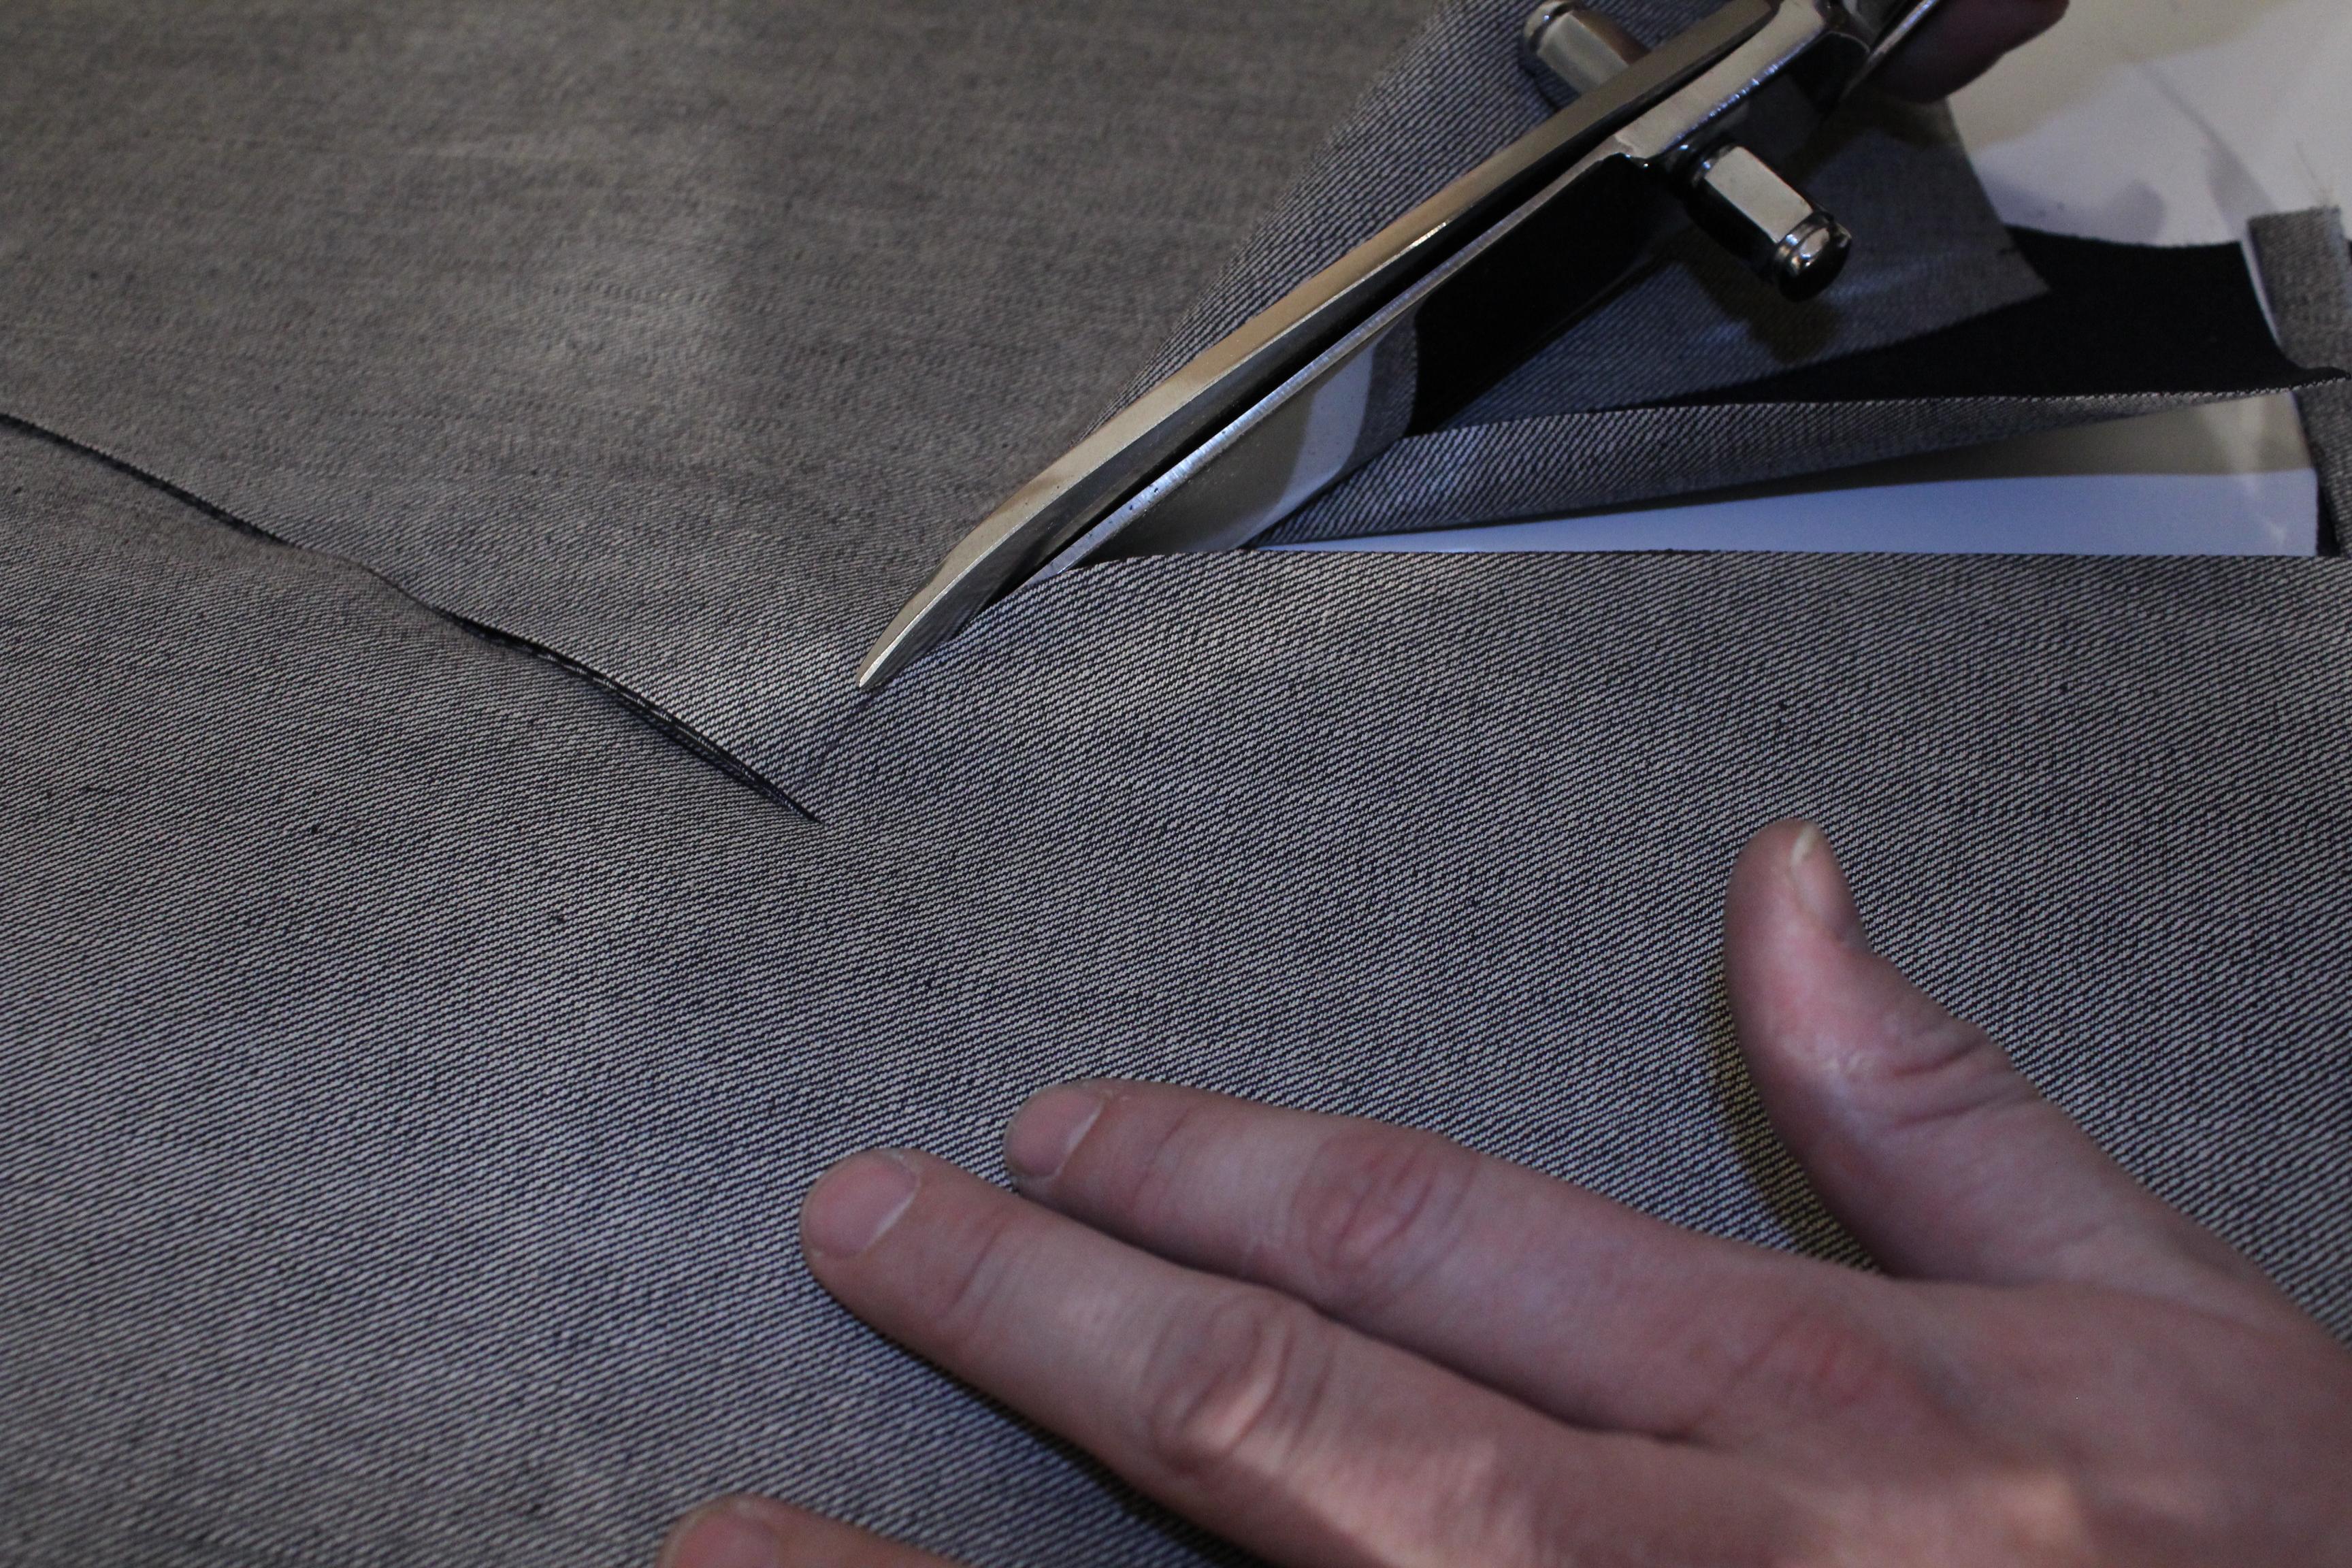 Ateliers de Nîmes artisans handcrafted denim